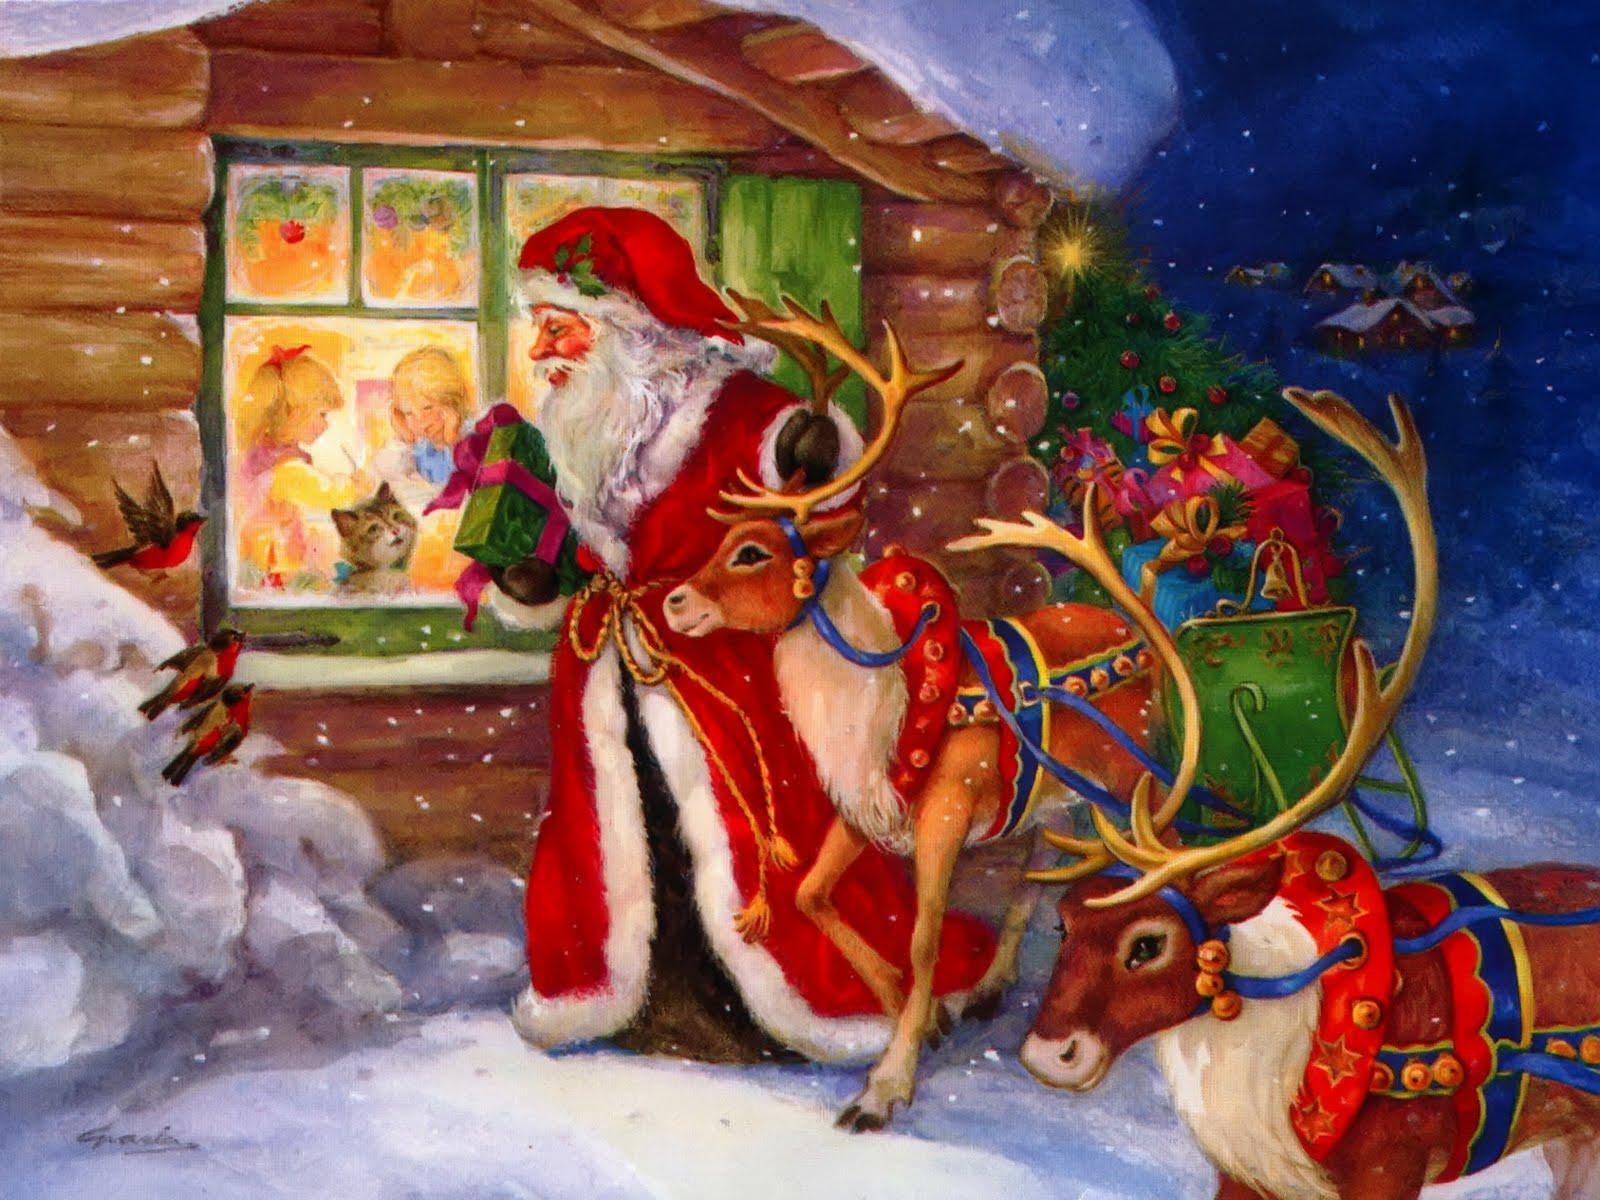 computer wallpaper santa claus face - photo #47